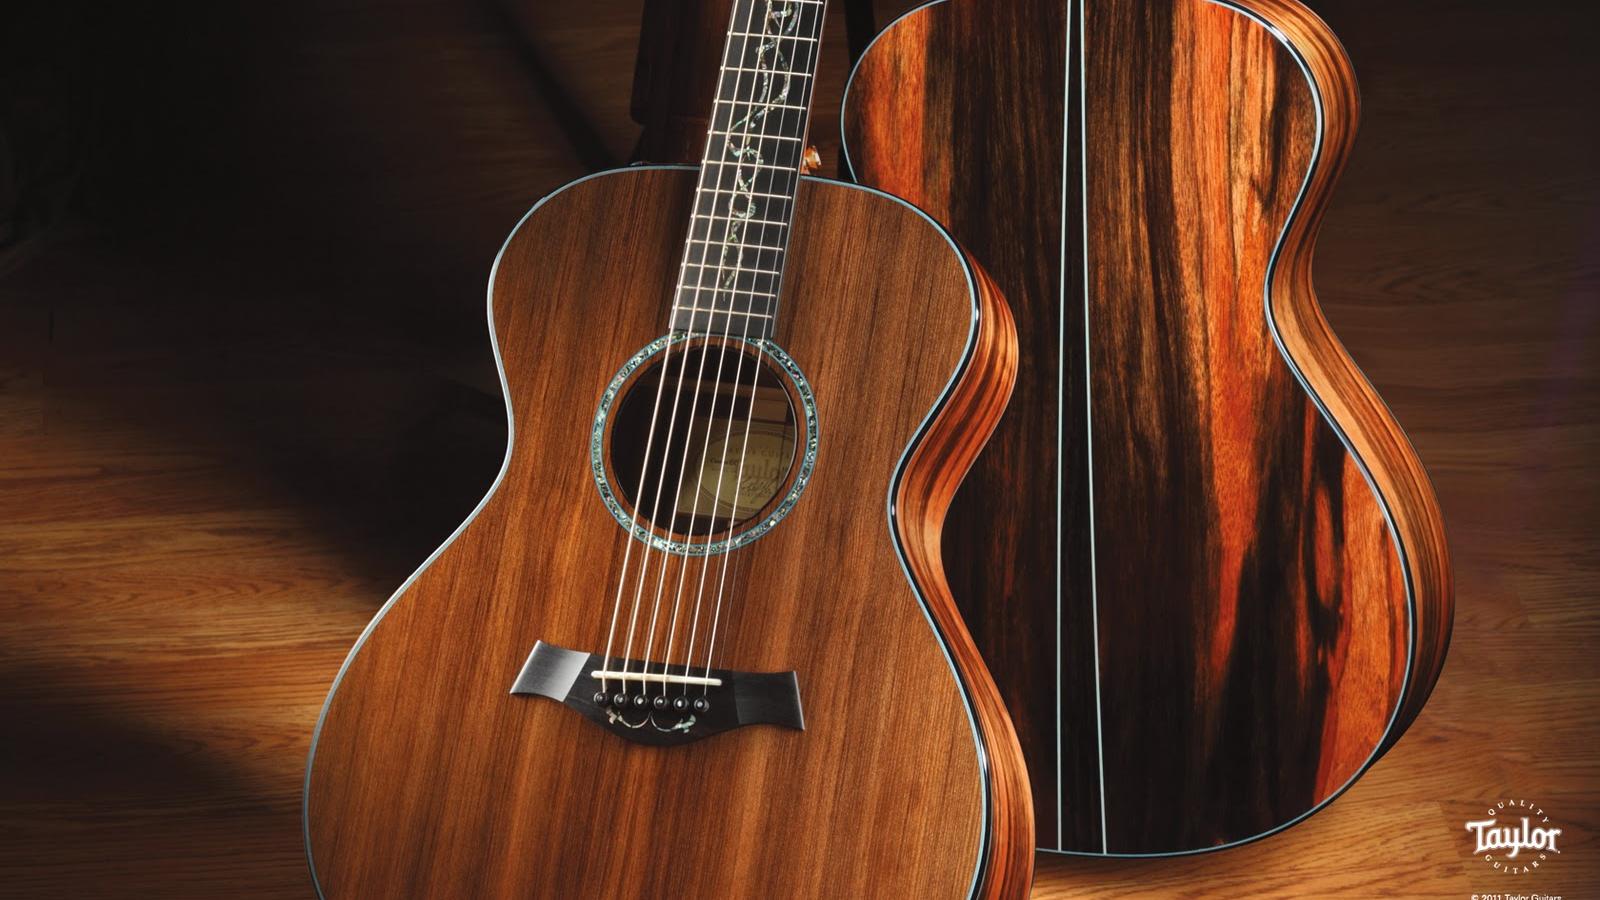 Free Download Taylor Guitars Taylor Guitars Wallpapers